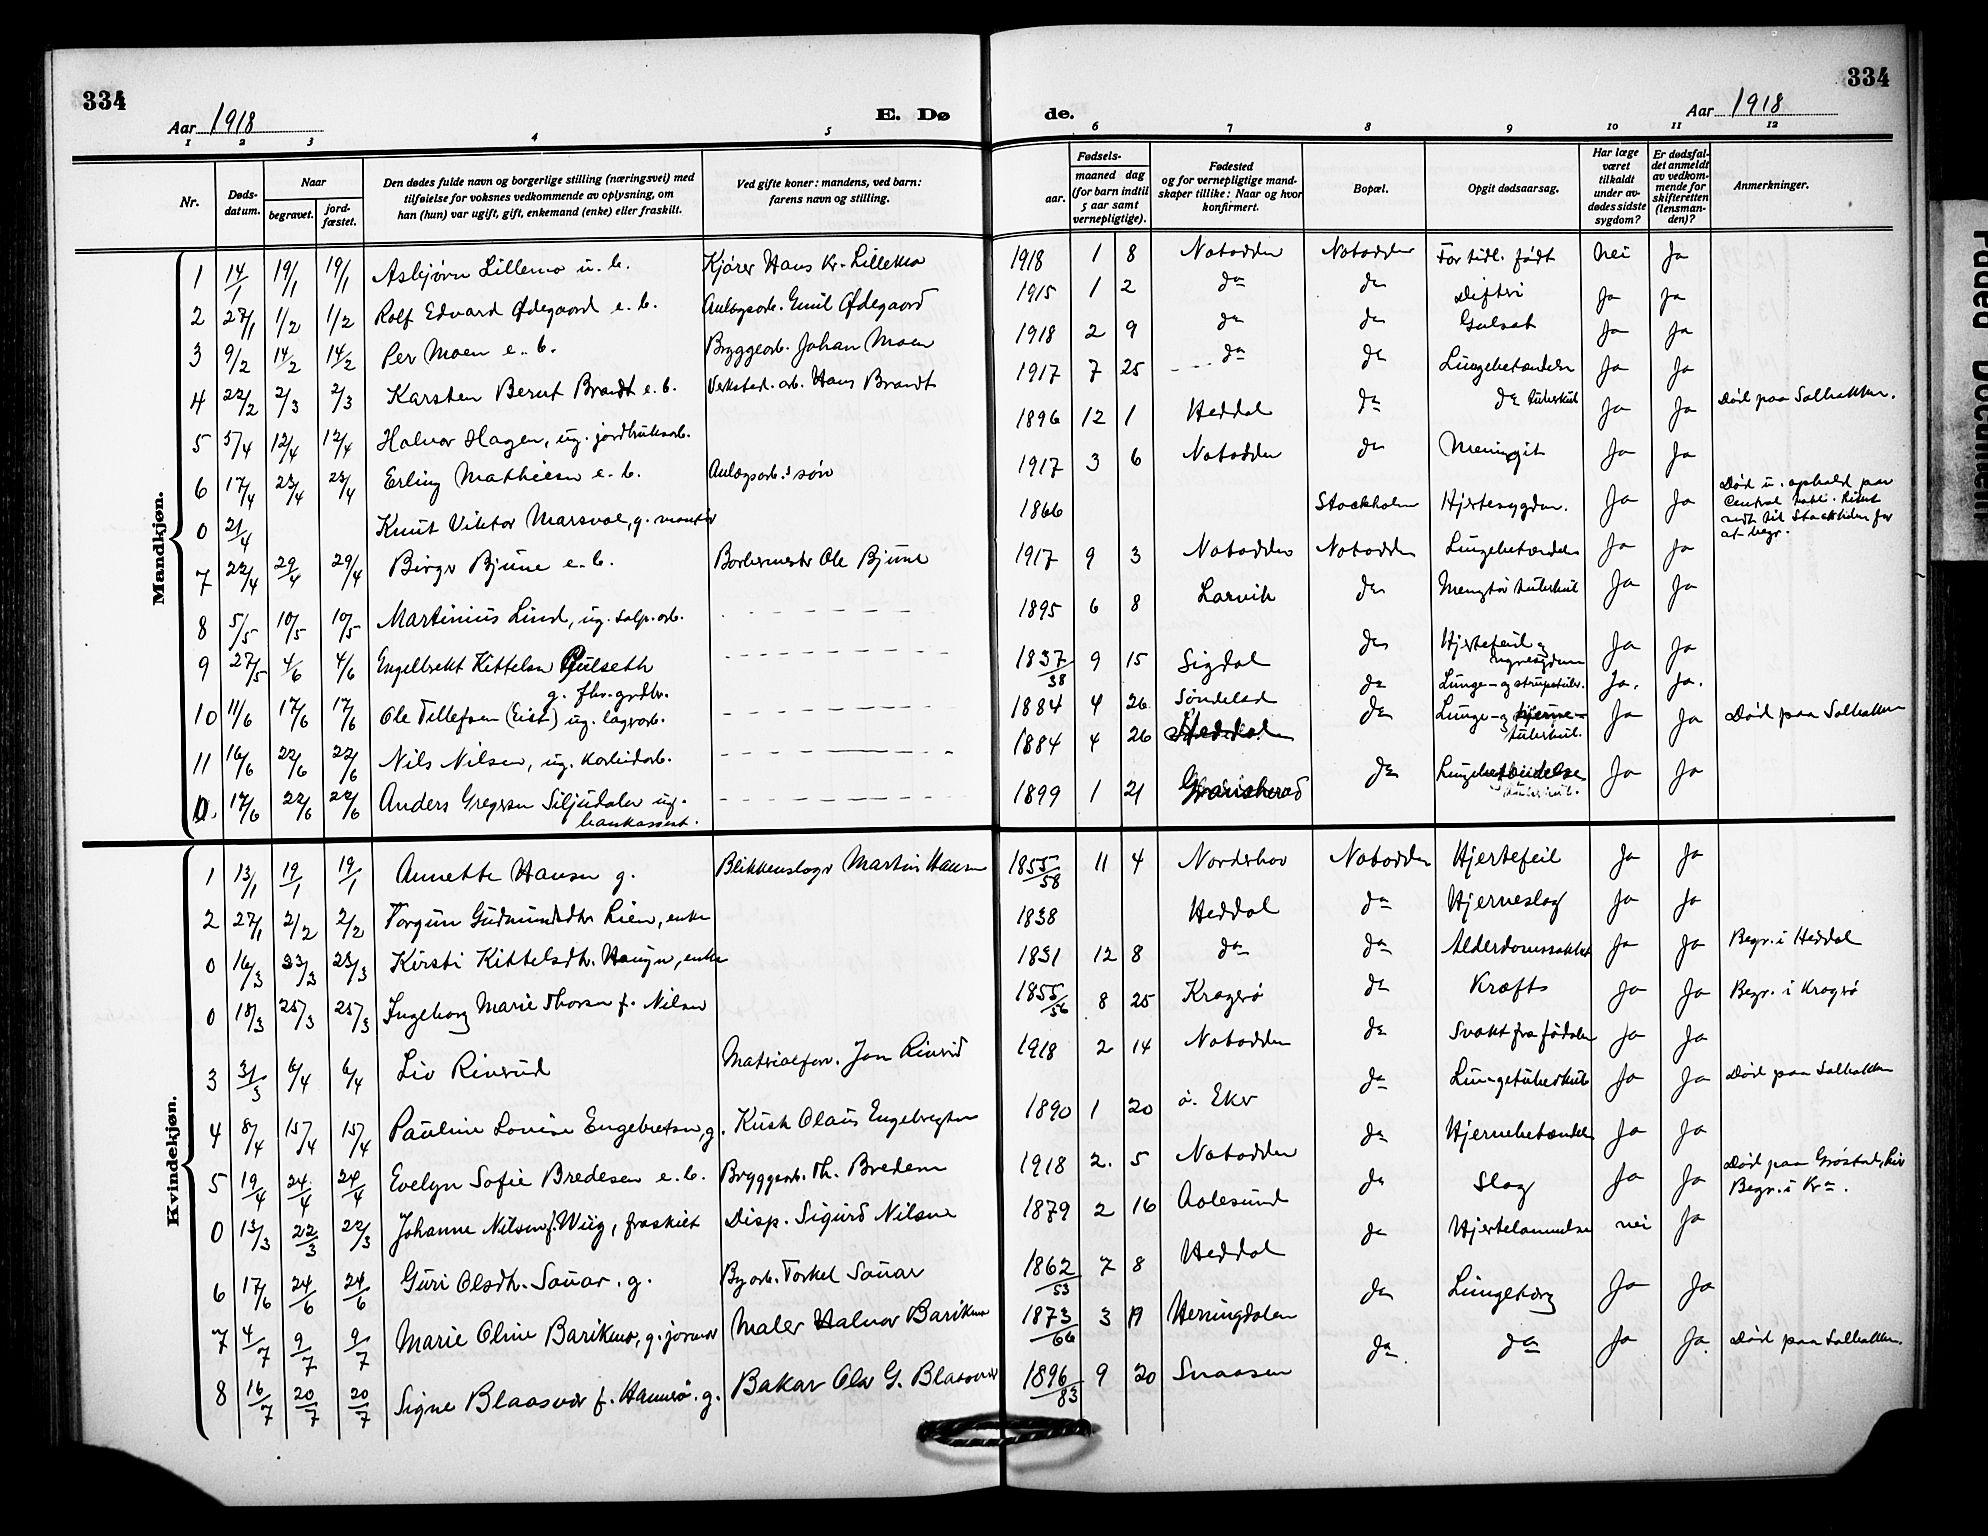 SAKO, Notodden kirkebøker, G/Ga/L0001: Klokkerbok nr. 1, 1912-1923, s. 334